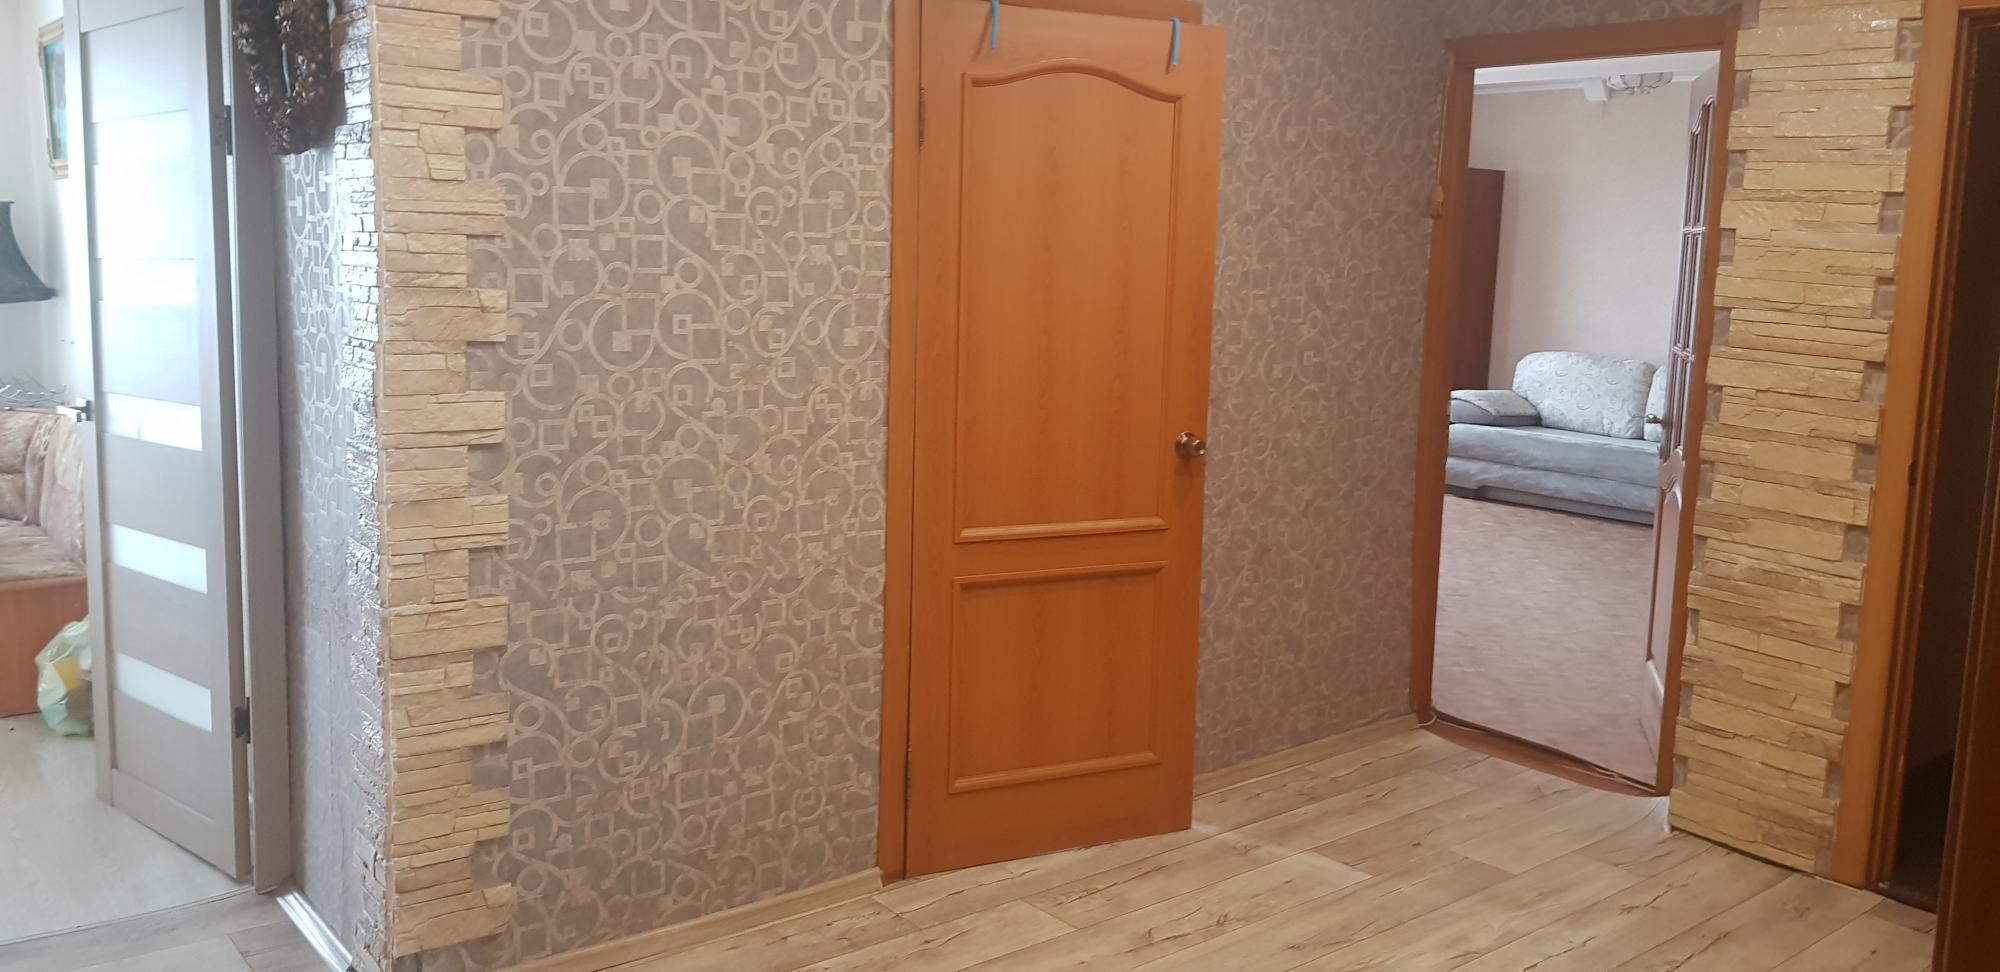 2к квартира улица Краснодарская, 3 | 18000 | аренда в Красноярске фото 13